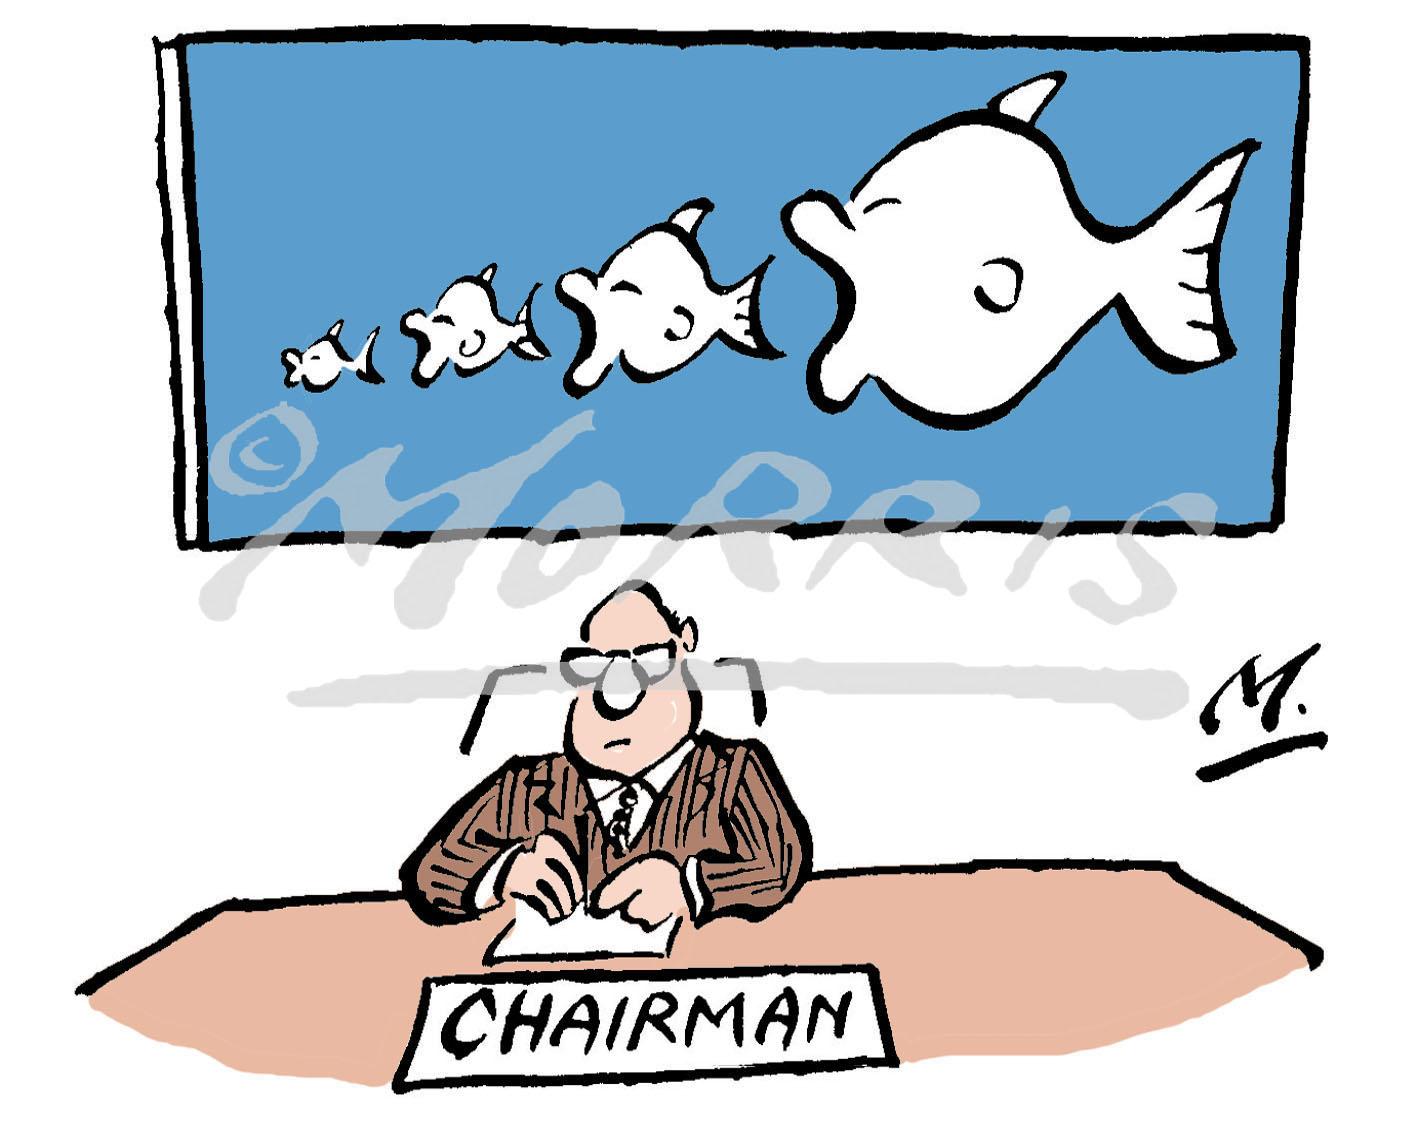 Chairman cartoon, takeover cartoon – Ref: 1474col